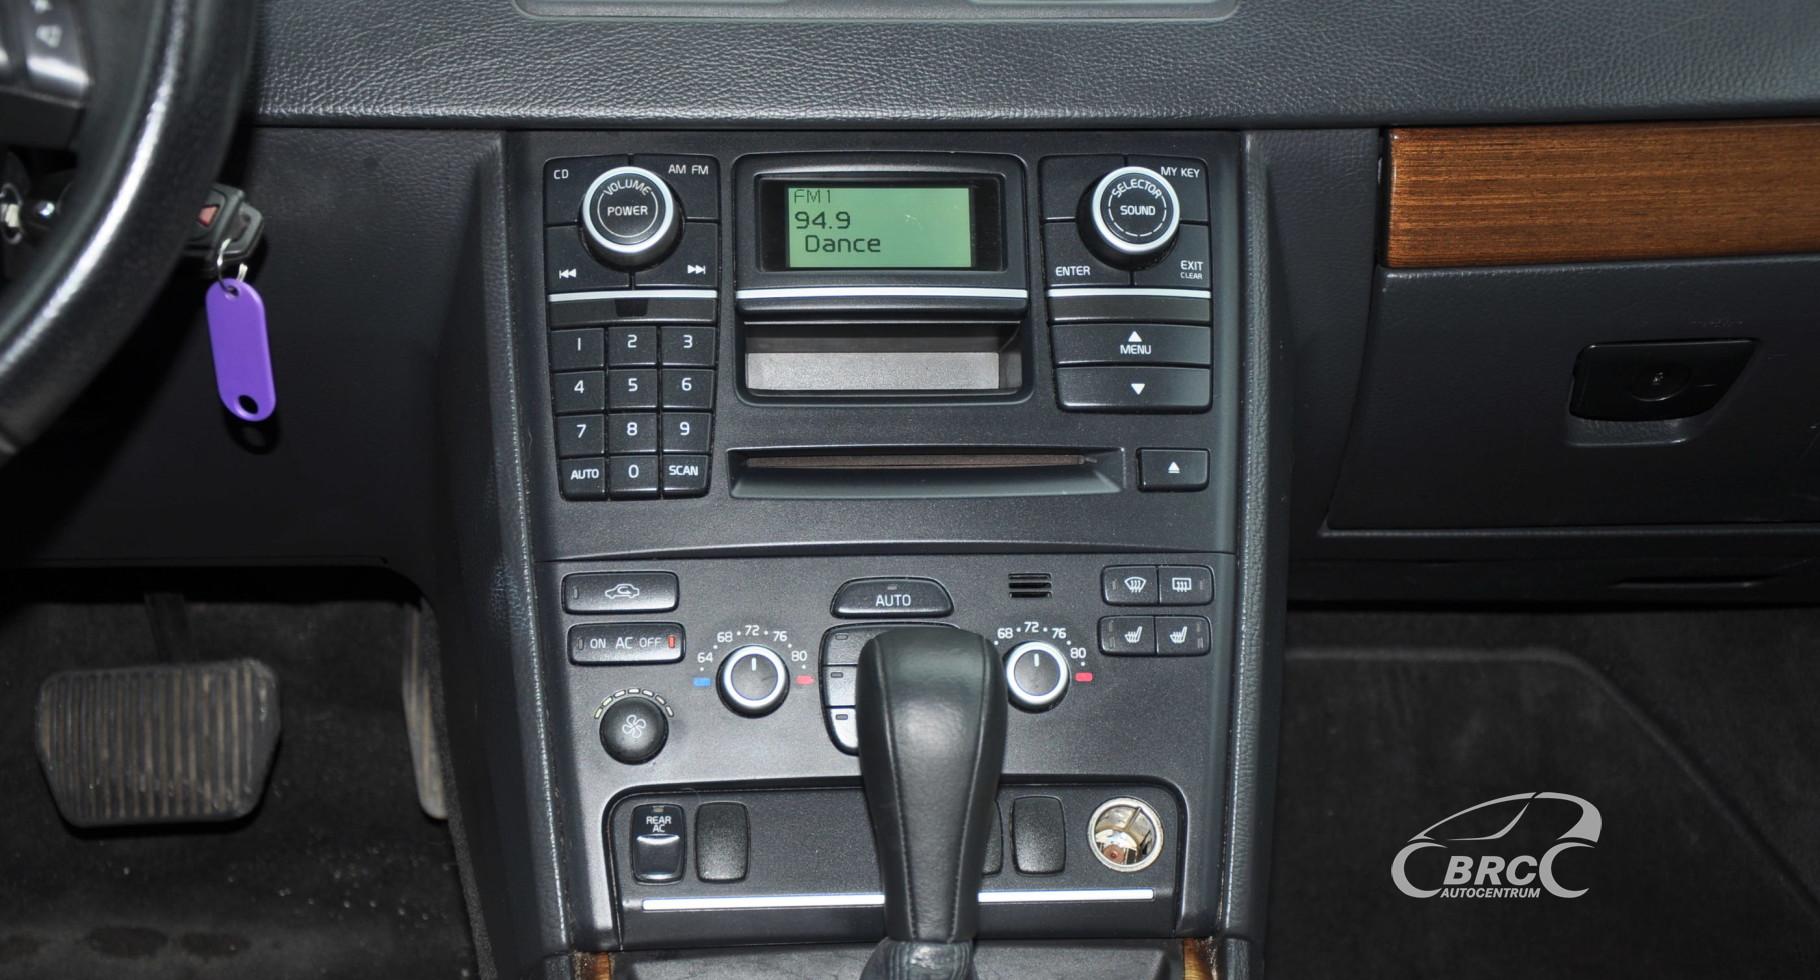 Volvo XC 90 3.2i AWD Automatas